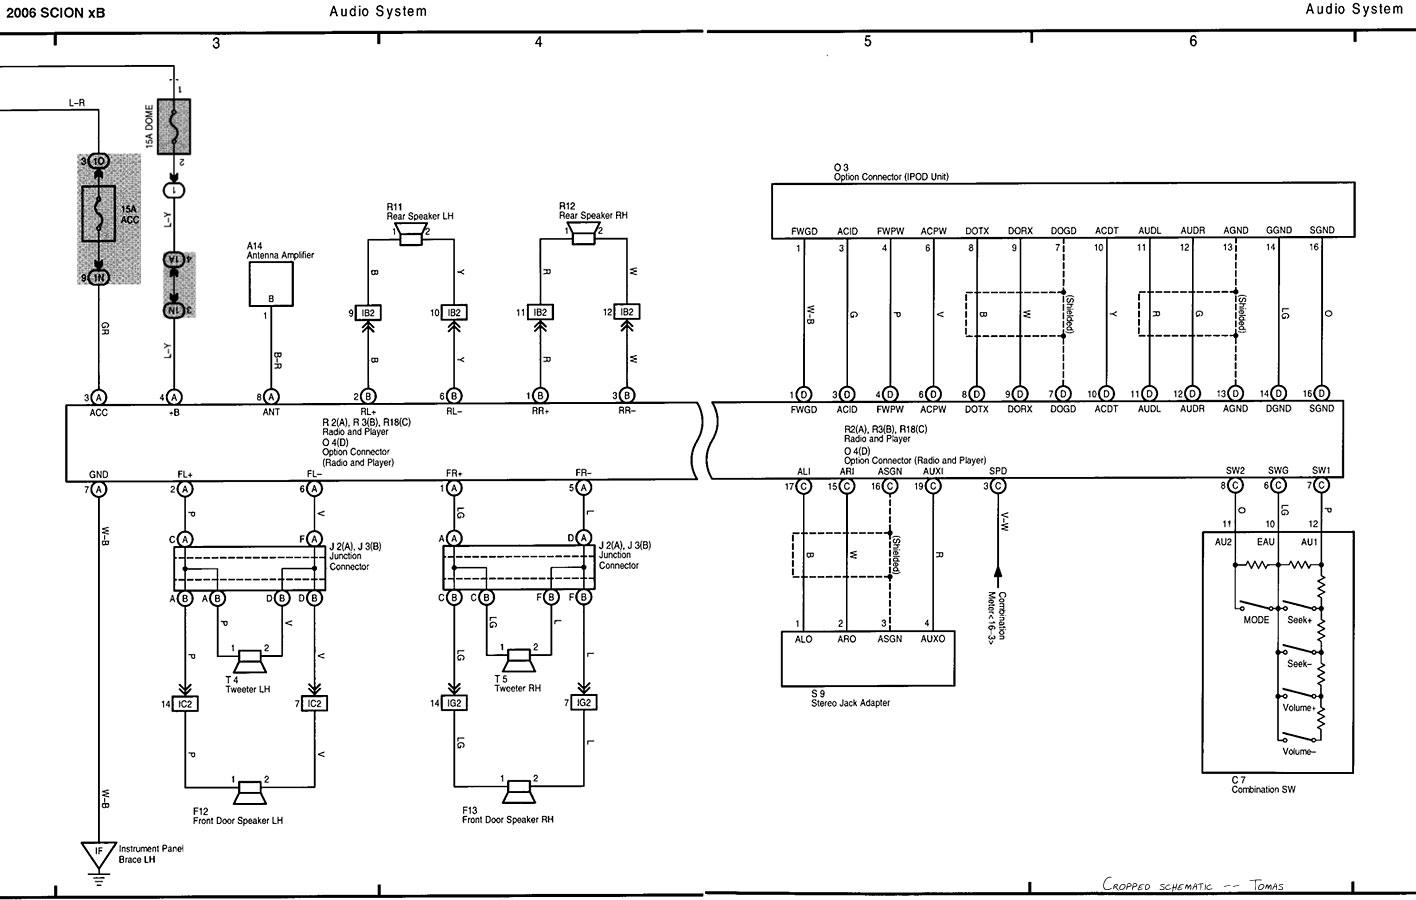 Frs Speaker Wiring Diagram 26 Wiring Diagram Images Wiring Ford Explorer Radio  Wiring Diagram Scion Fr S Stereo Wiring Diagram